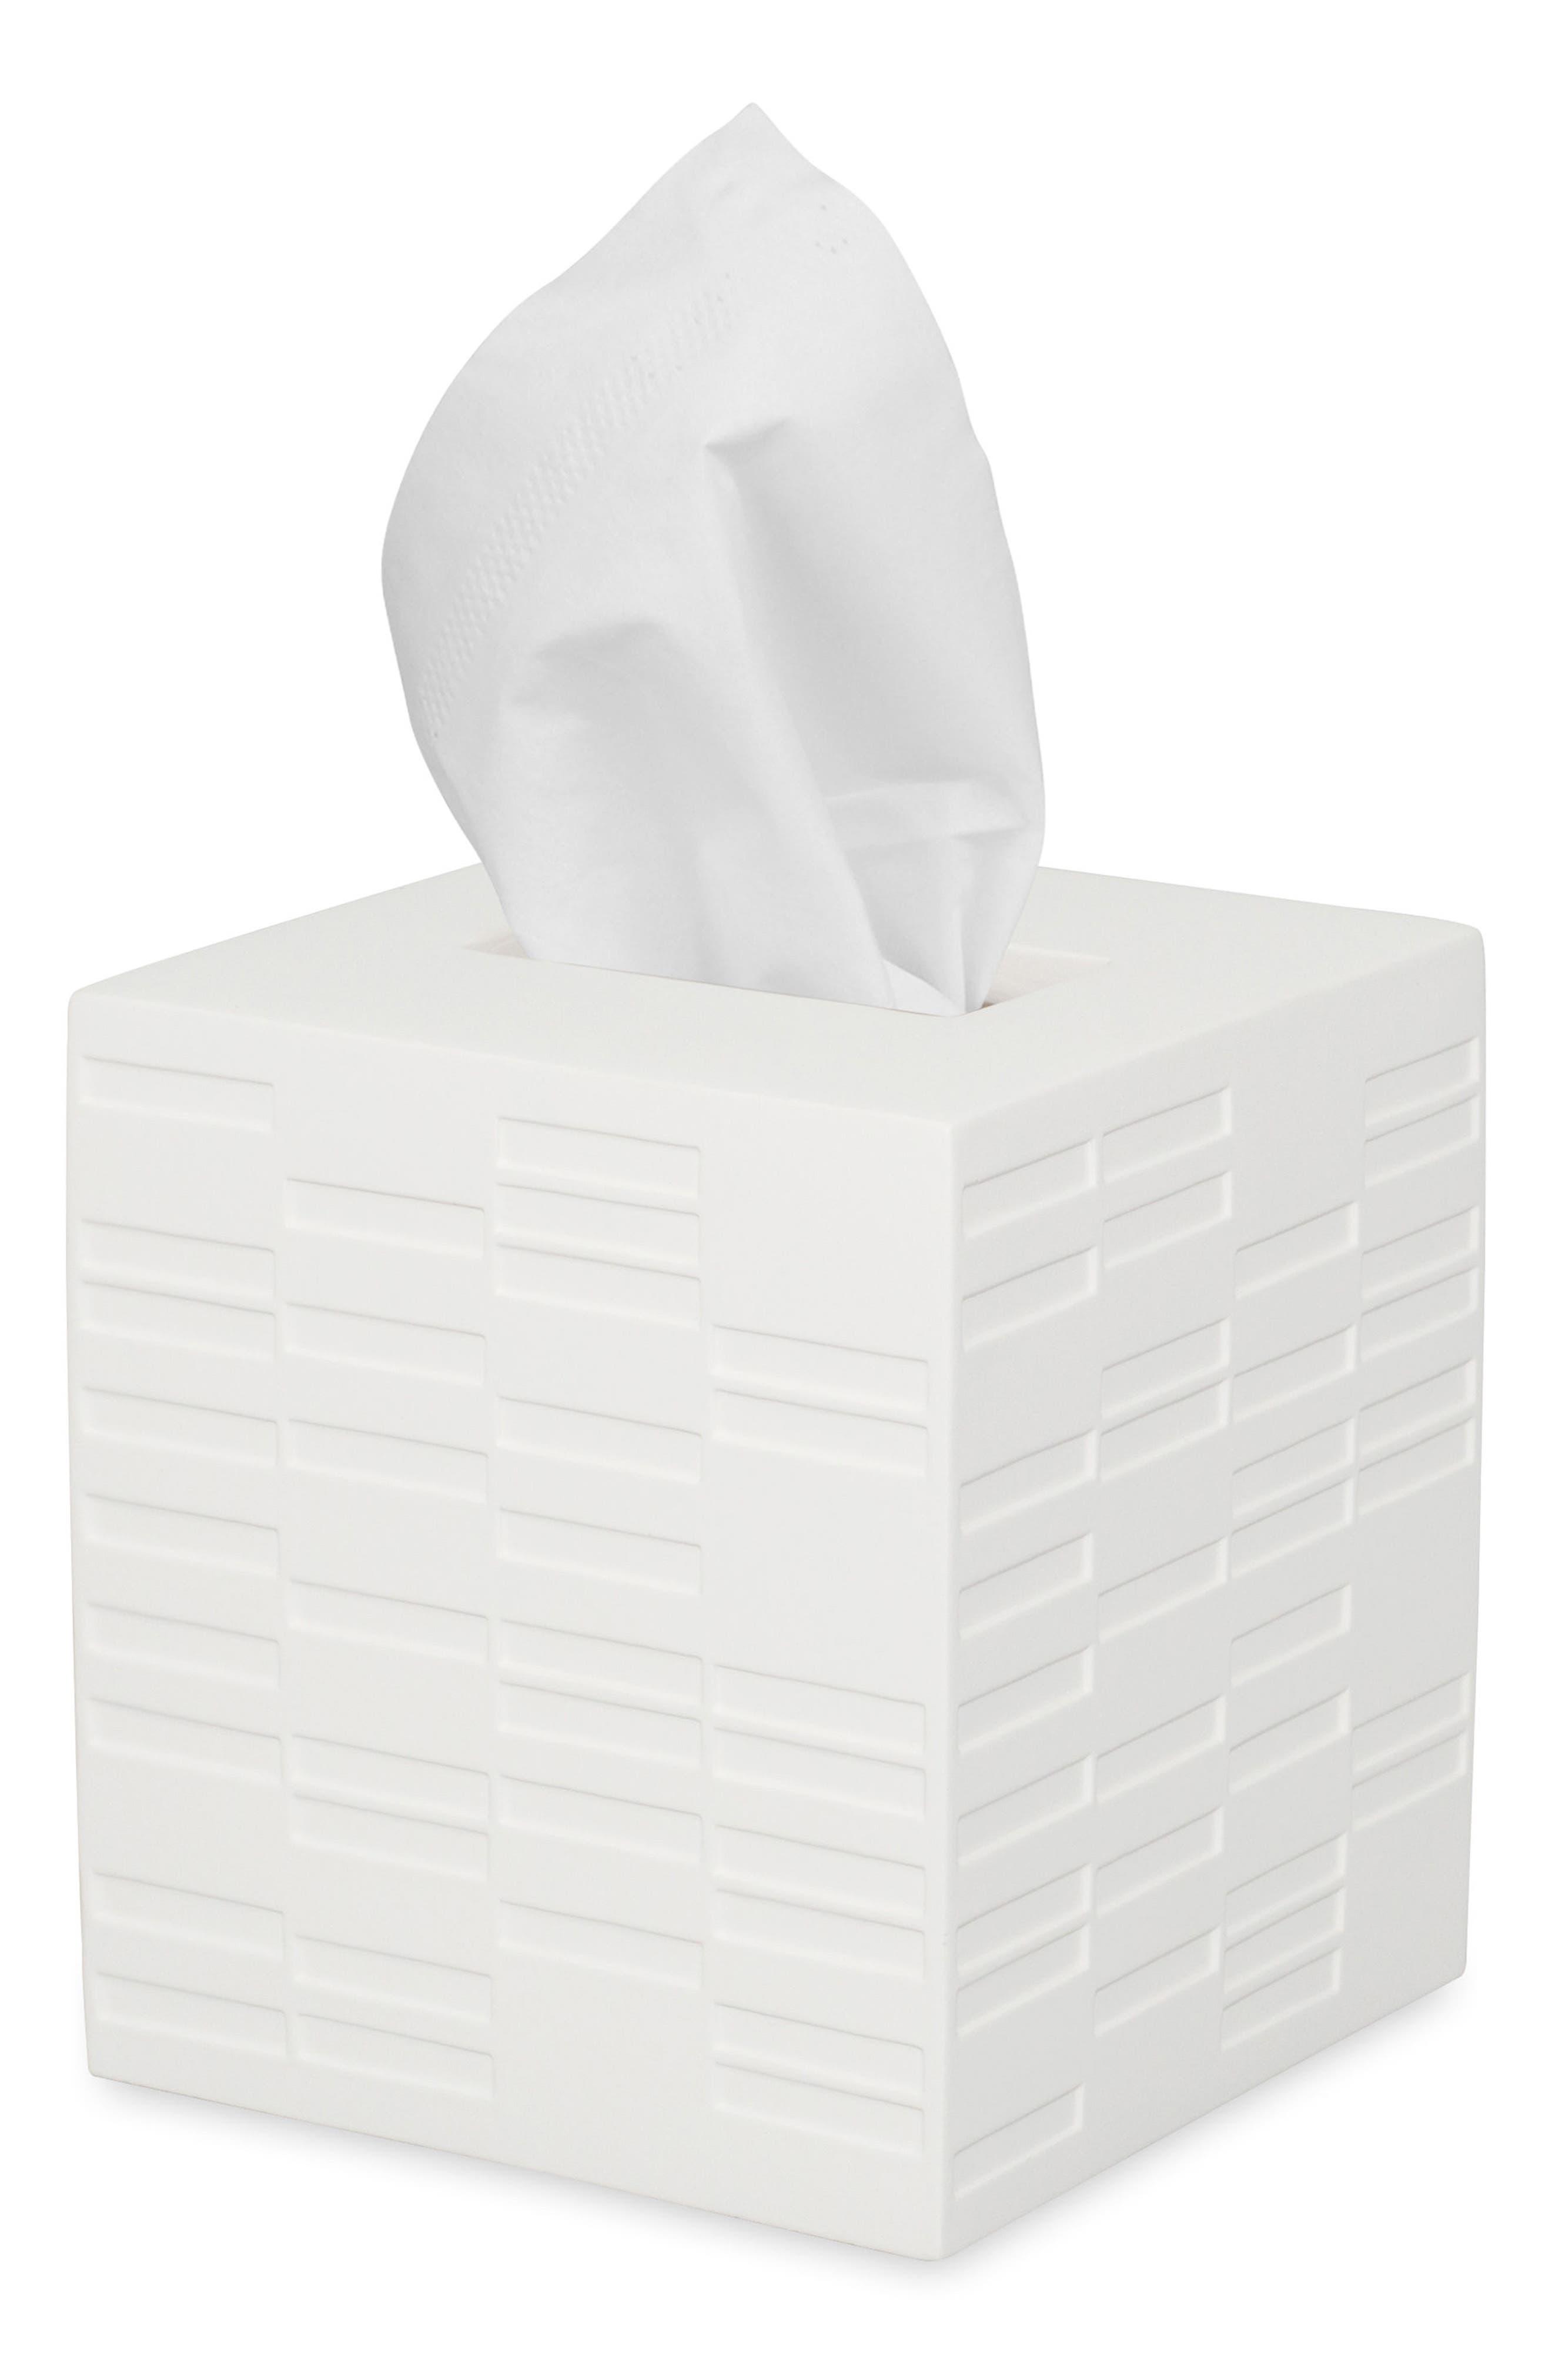 High Rise Tissue Box Cover,                         Main,                         color, White